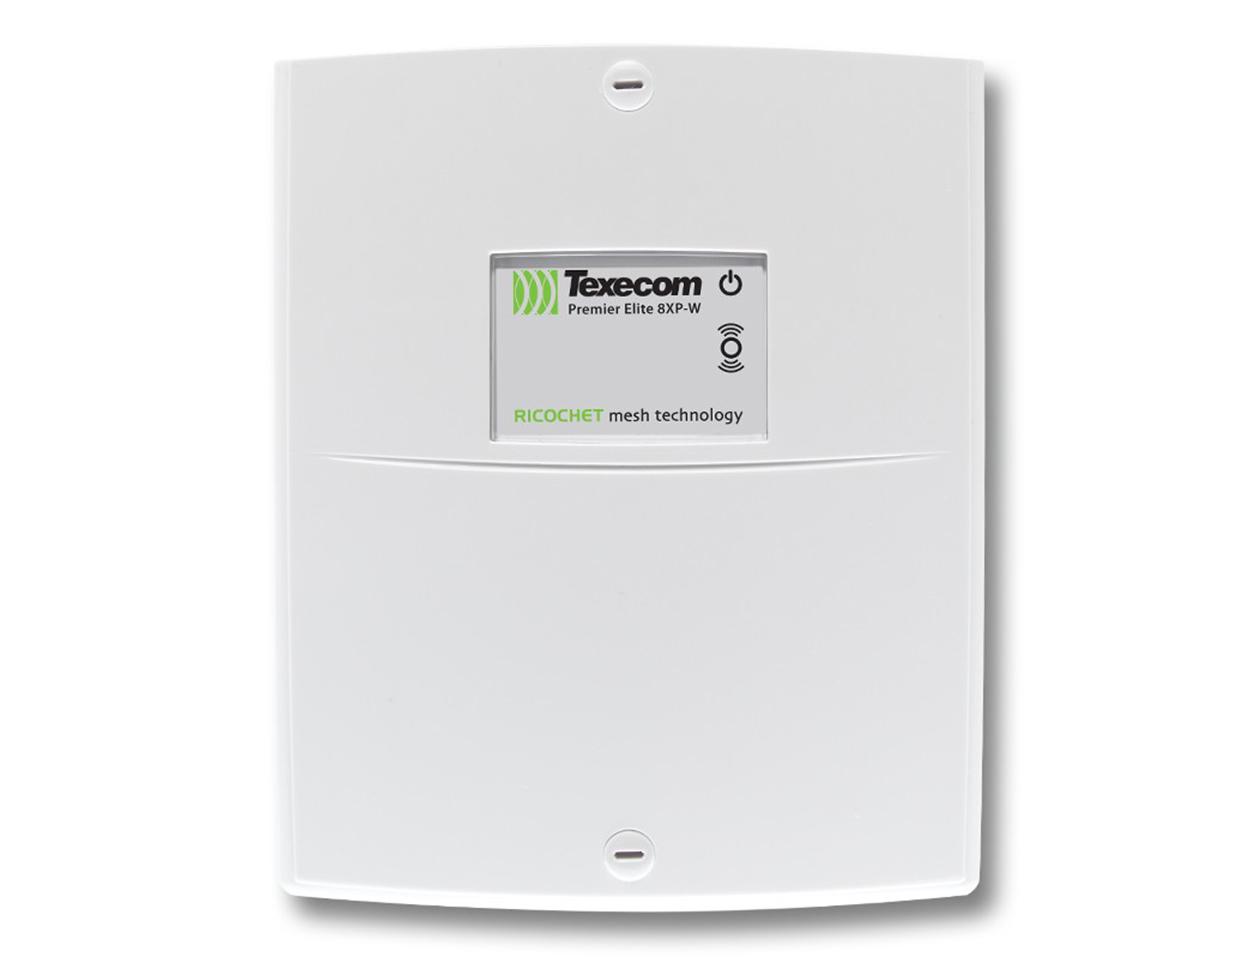 Texecom-Premier-Elite_8XP-W.jpg